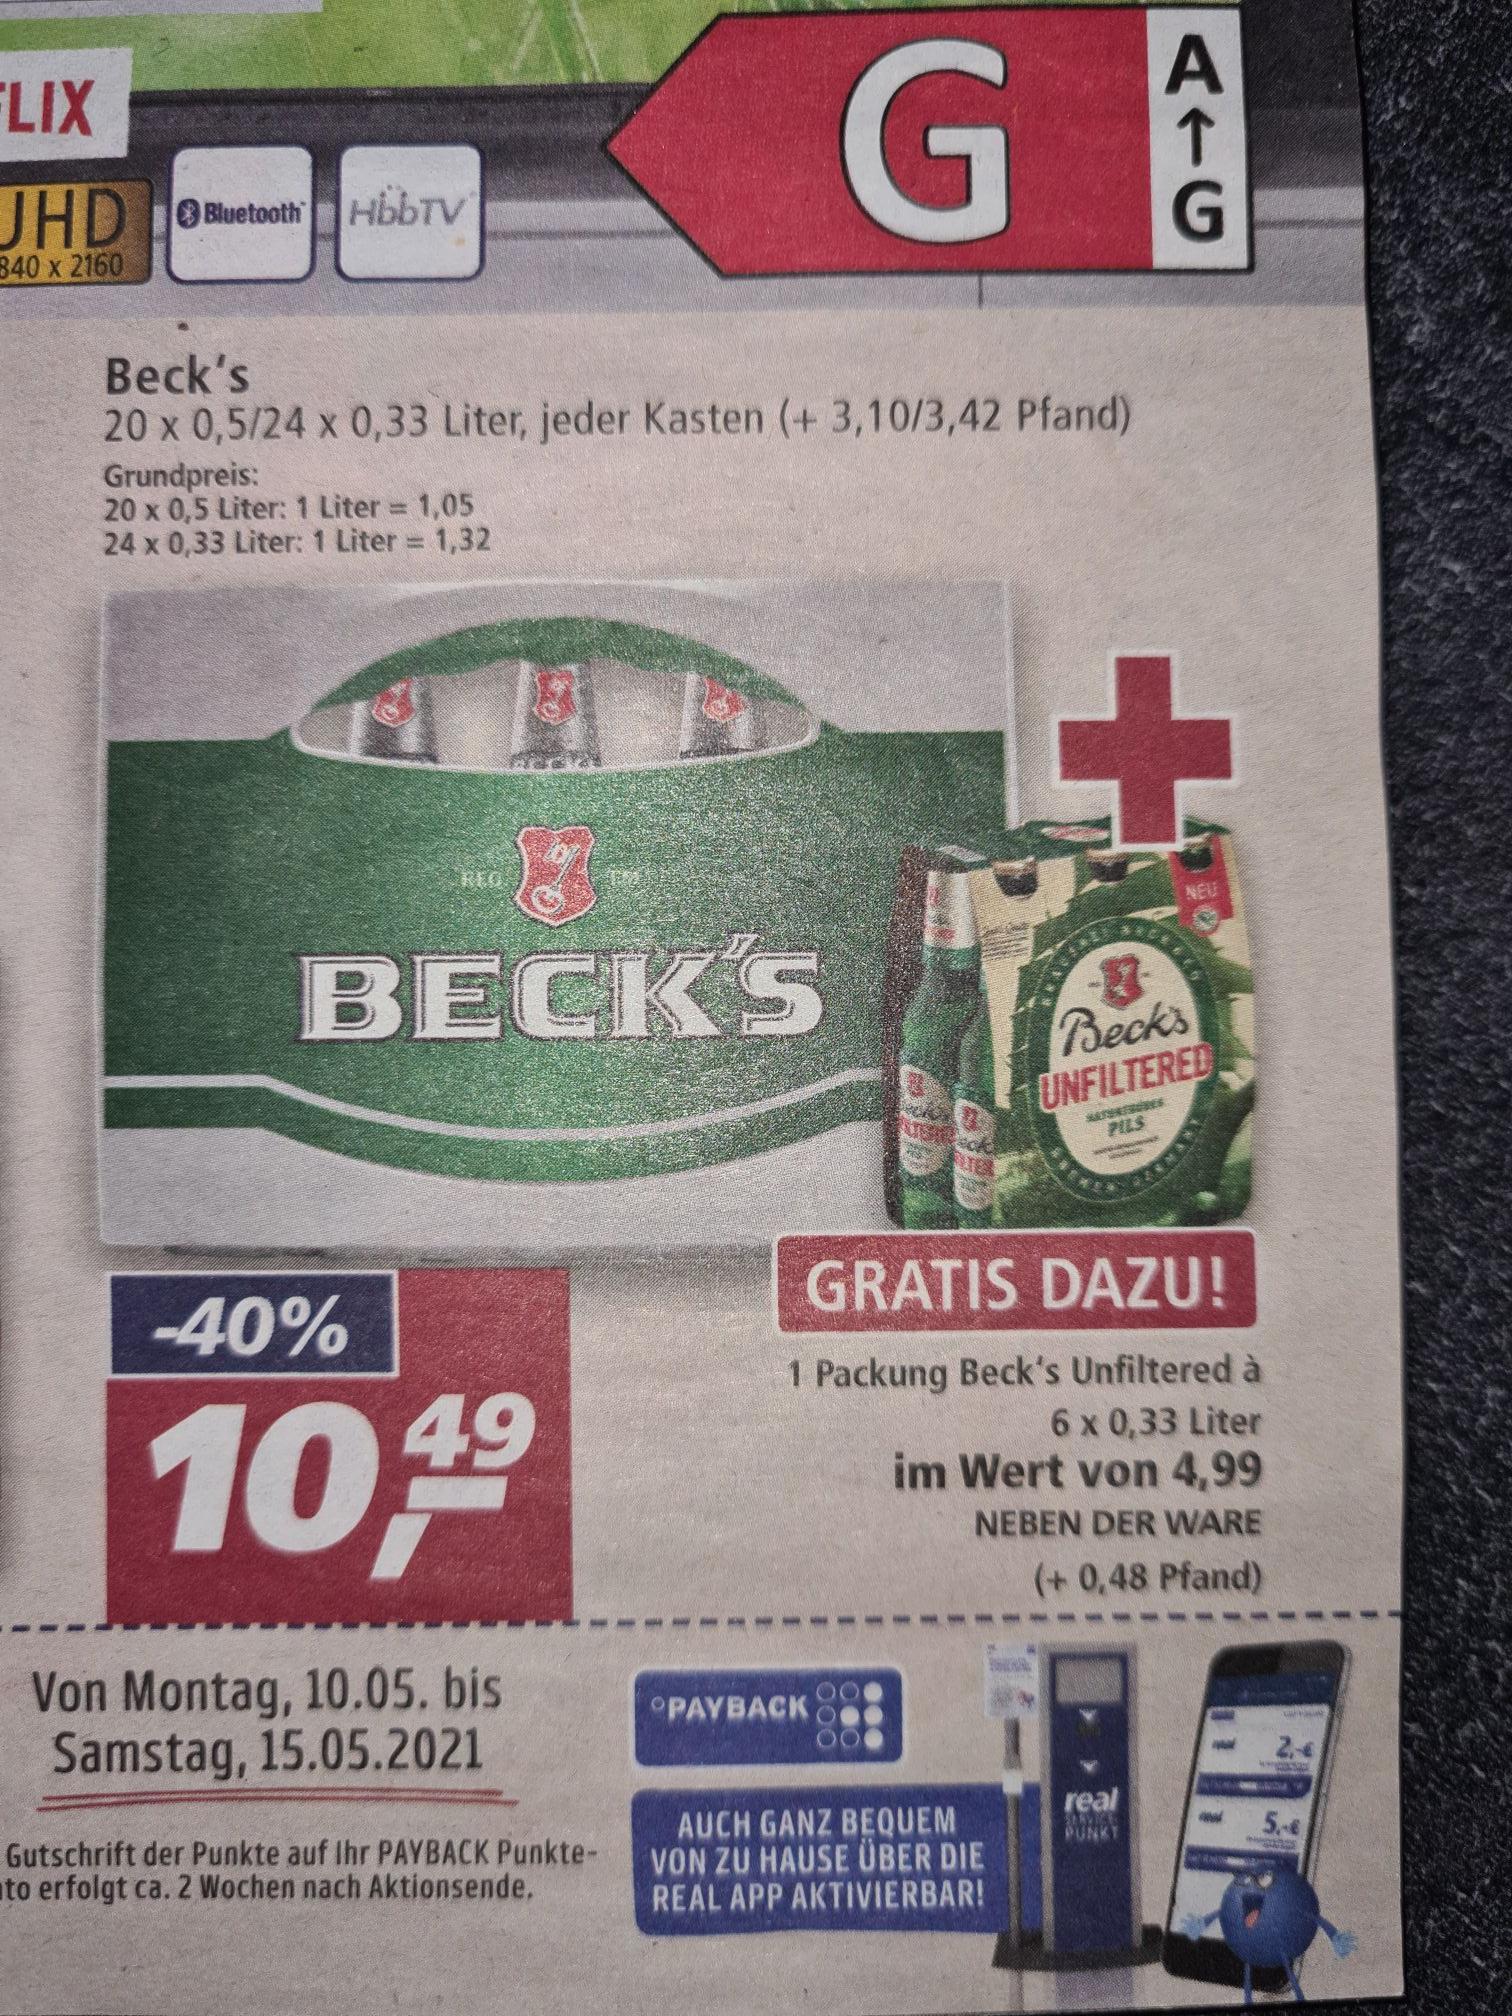 Real offline, Beck's Kiste mit 24*0,33 oder 20*0,5 inklusive Sixpack Unfiltered. [Lokal Westen und Südwesten?]